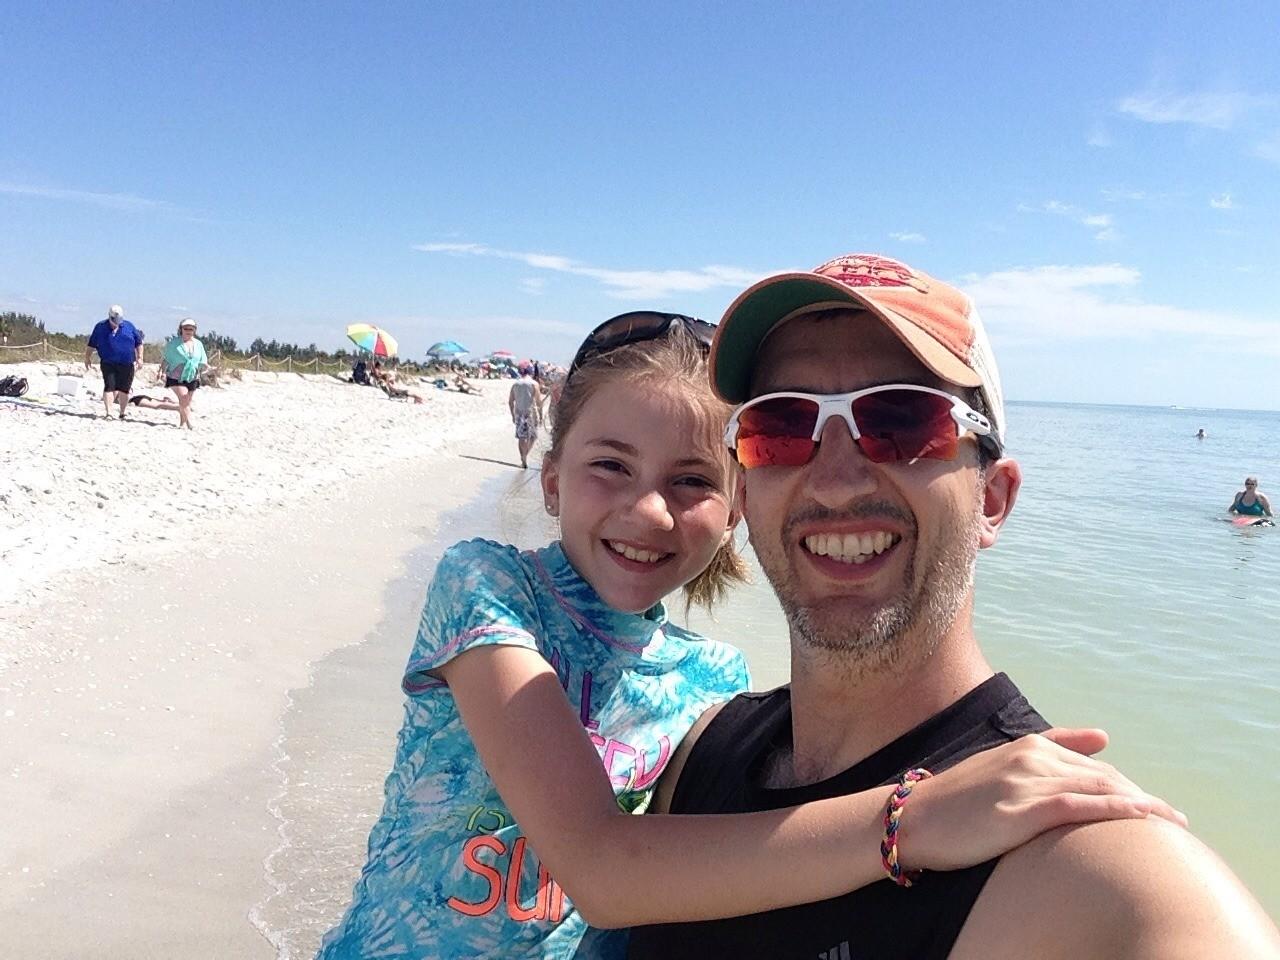 At the Florida beach